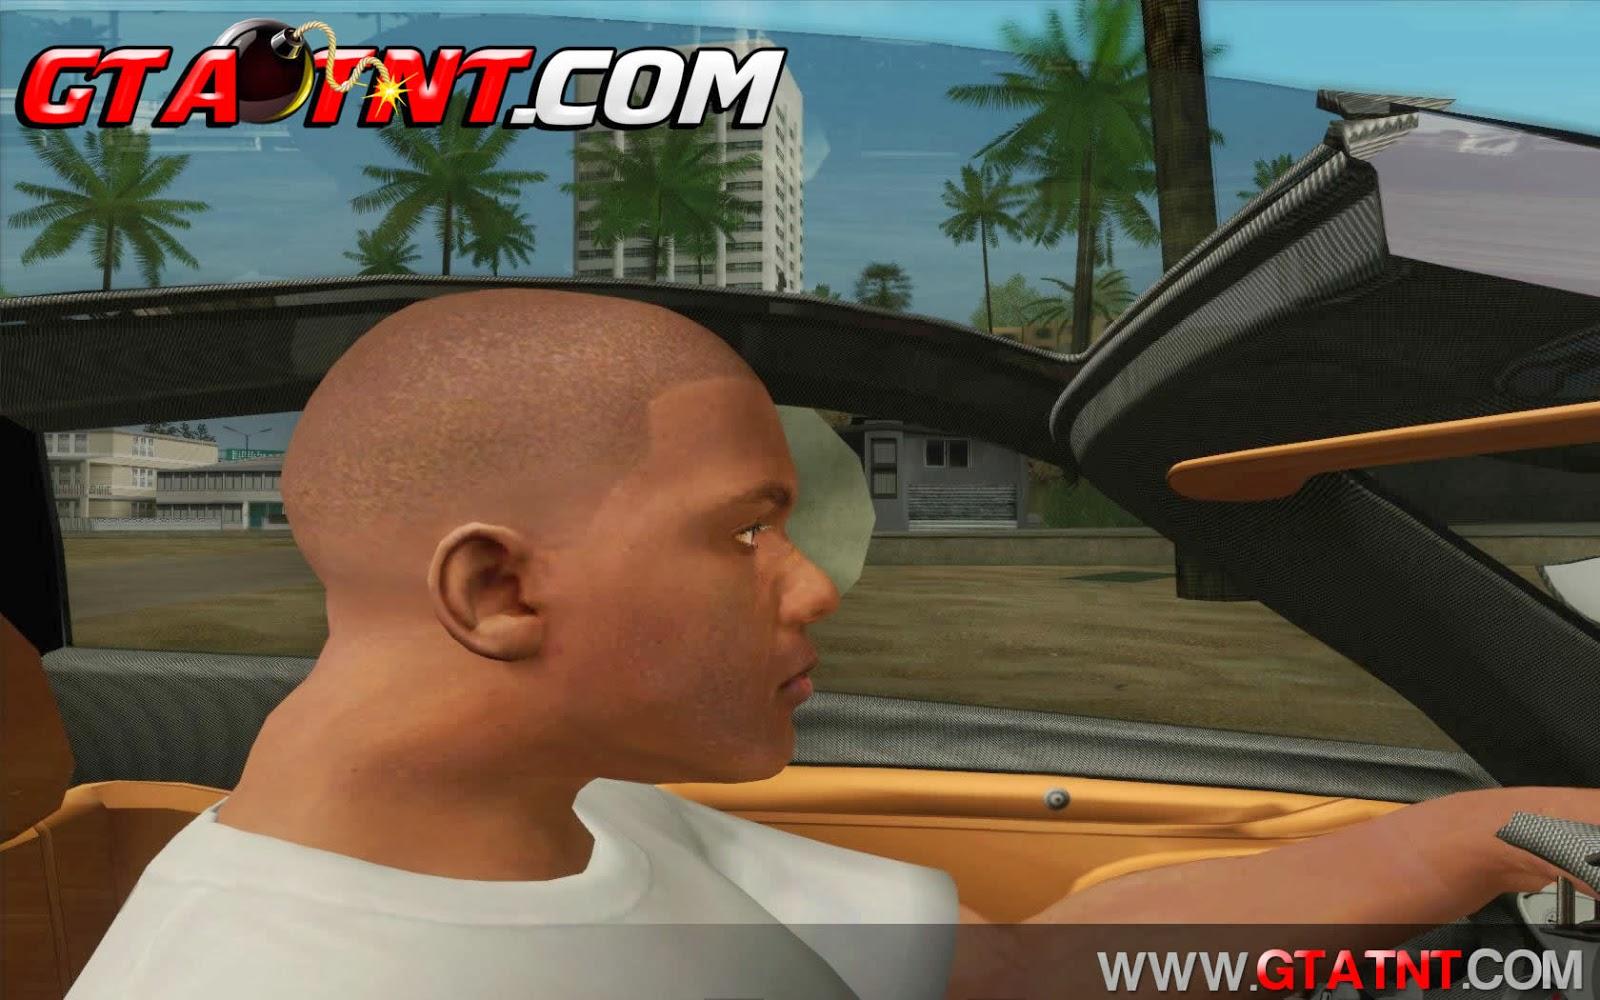 GTA SA - Auto retrato do GTA V